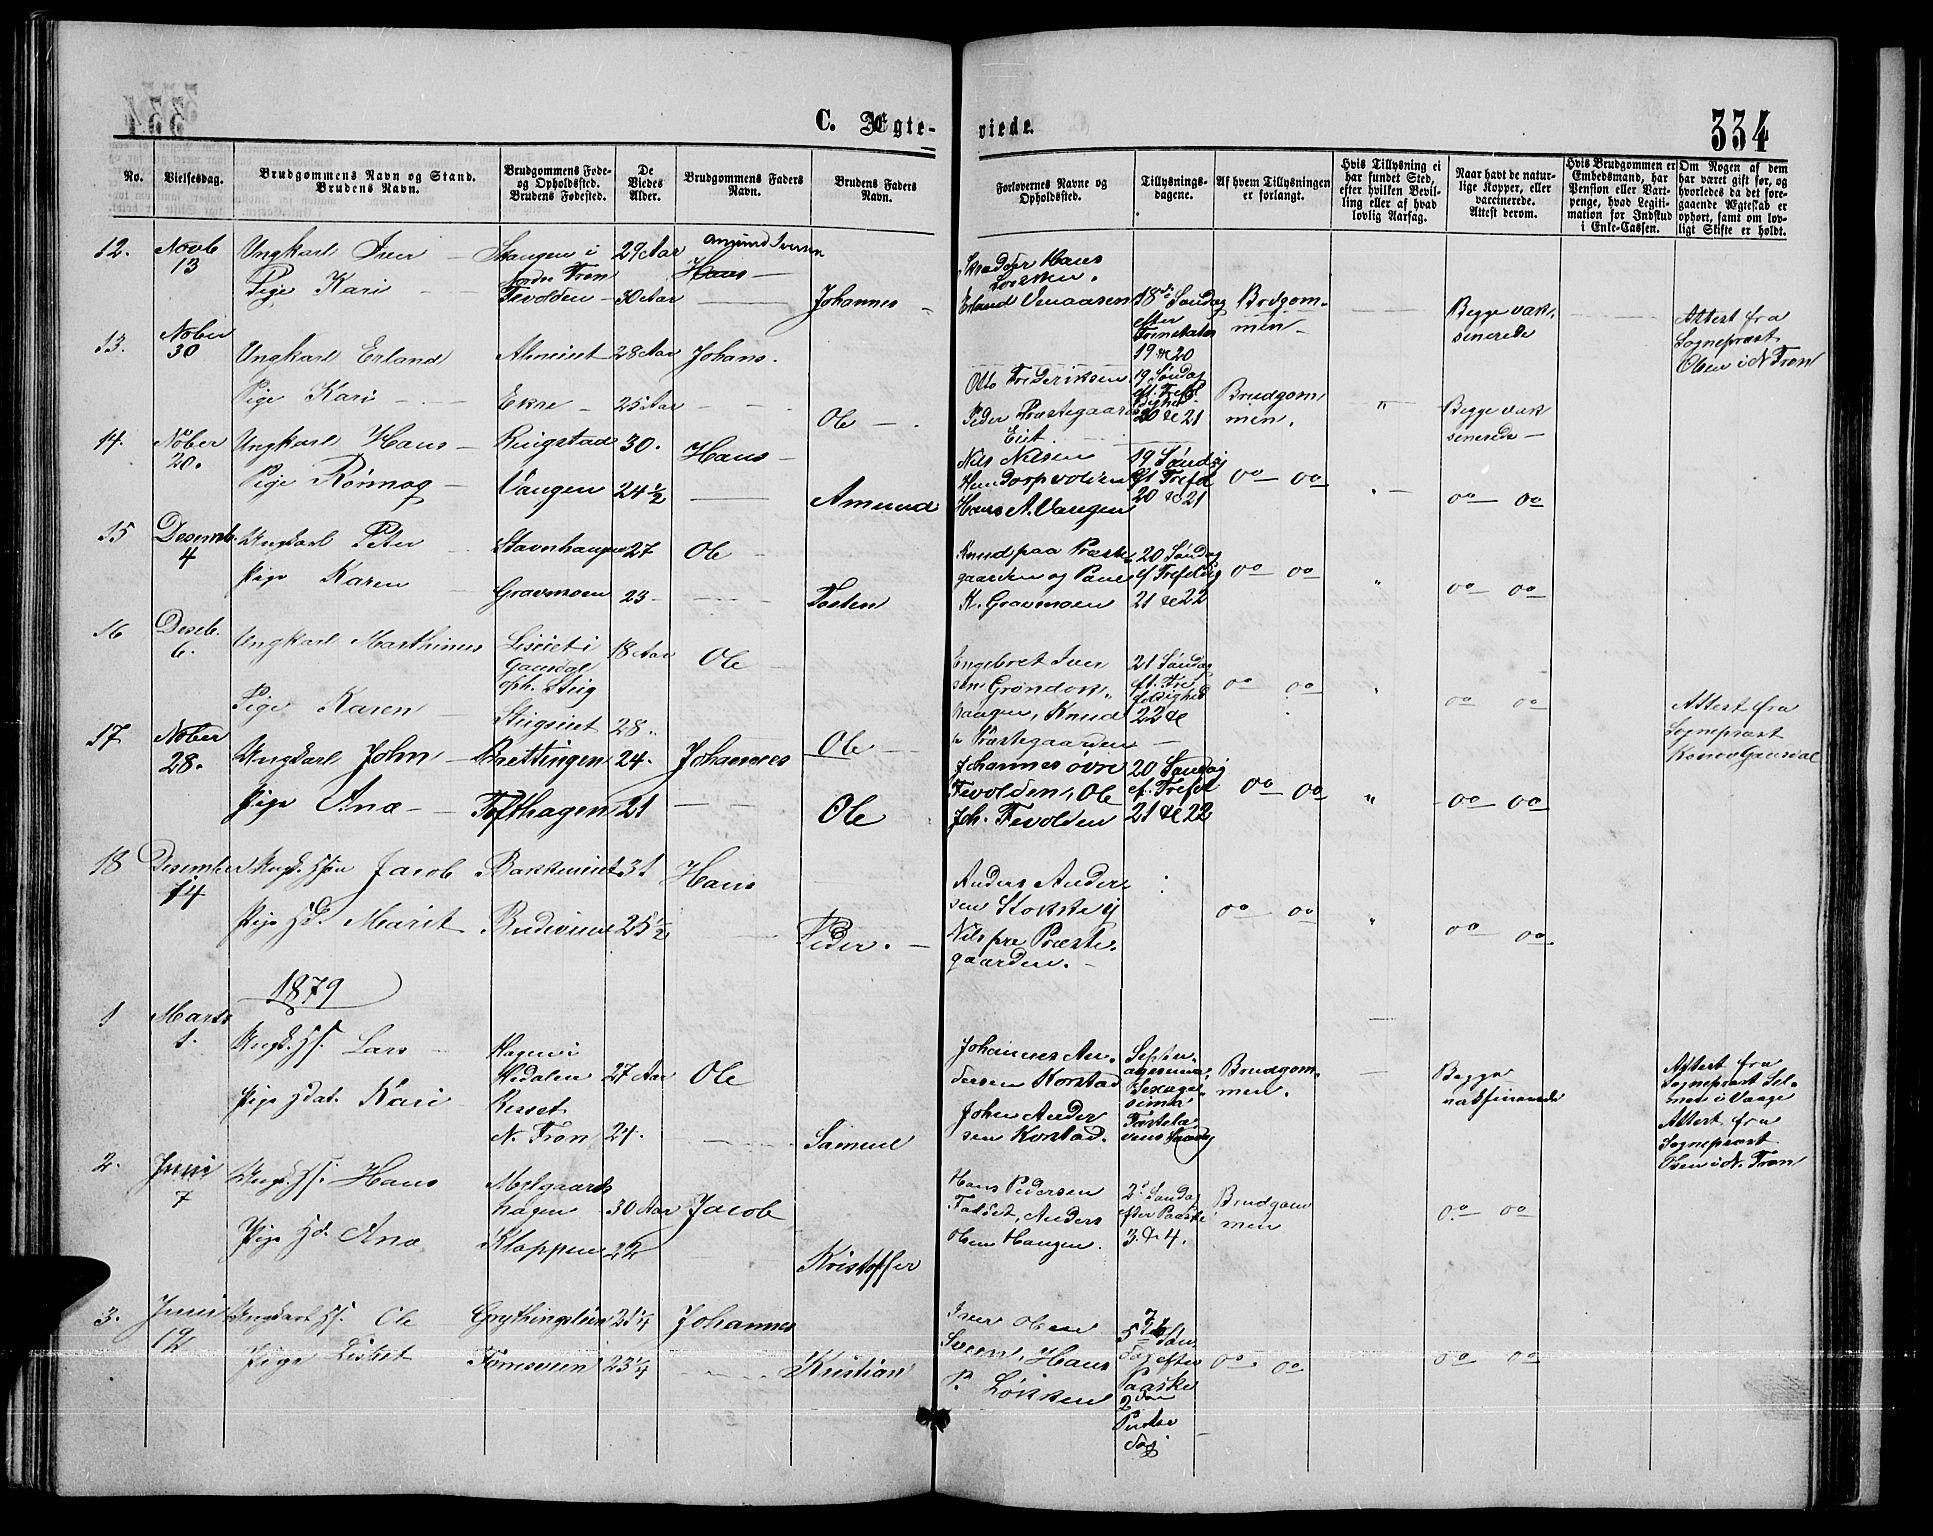 SAH, Sør-Fron prestekontor, H/Ha/Hab/L0002: Klokkerbok nr. 2, 1864-1883, s. 334